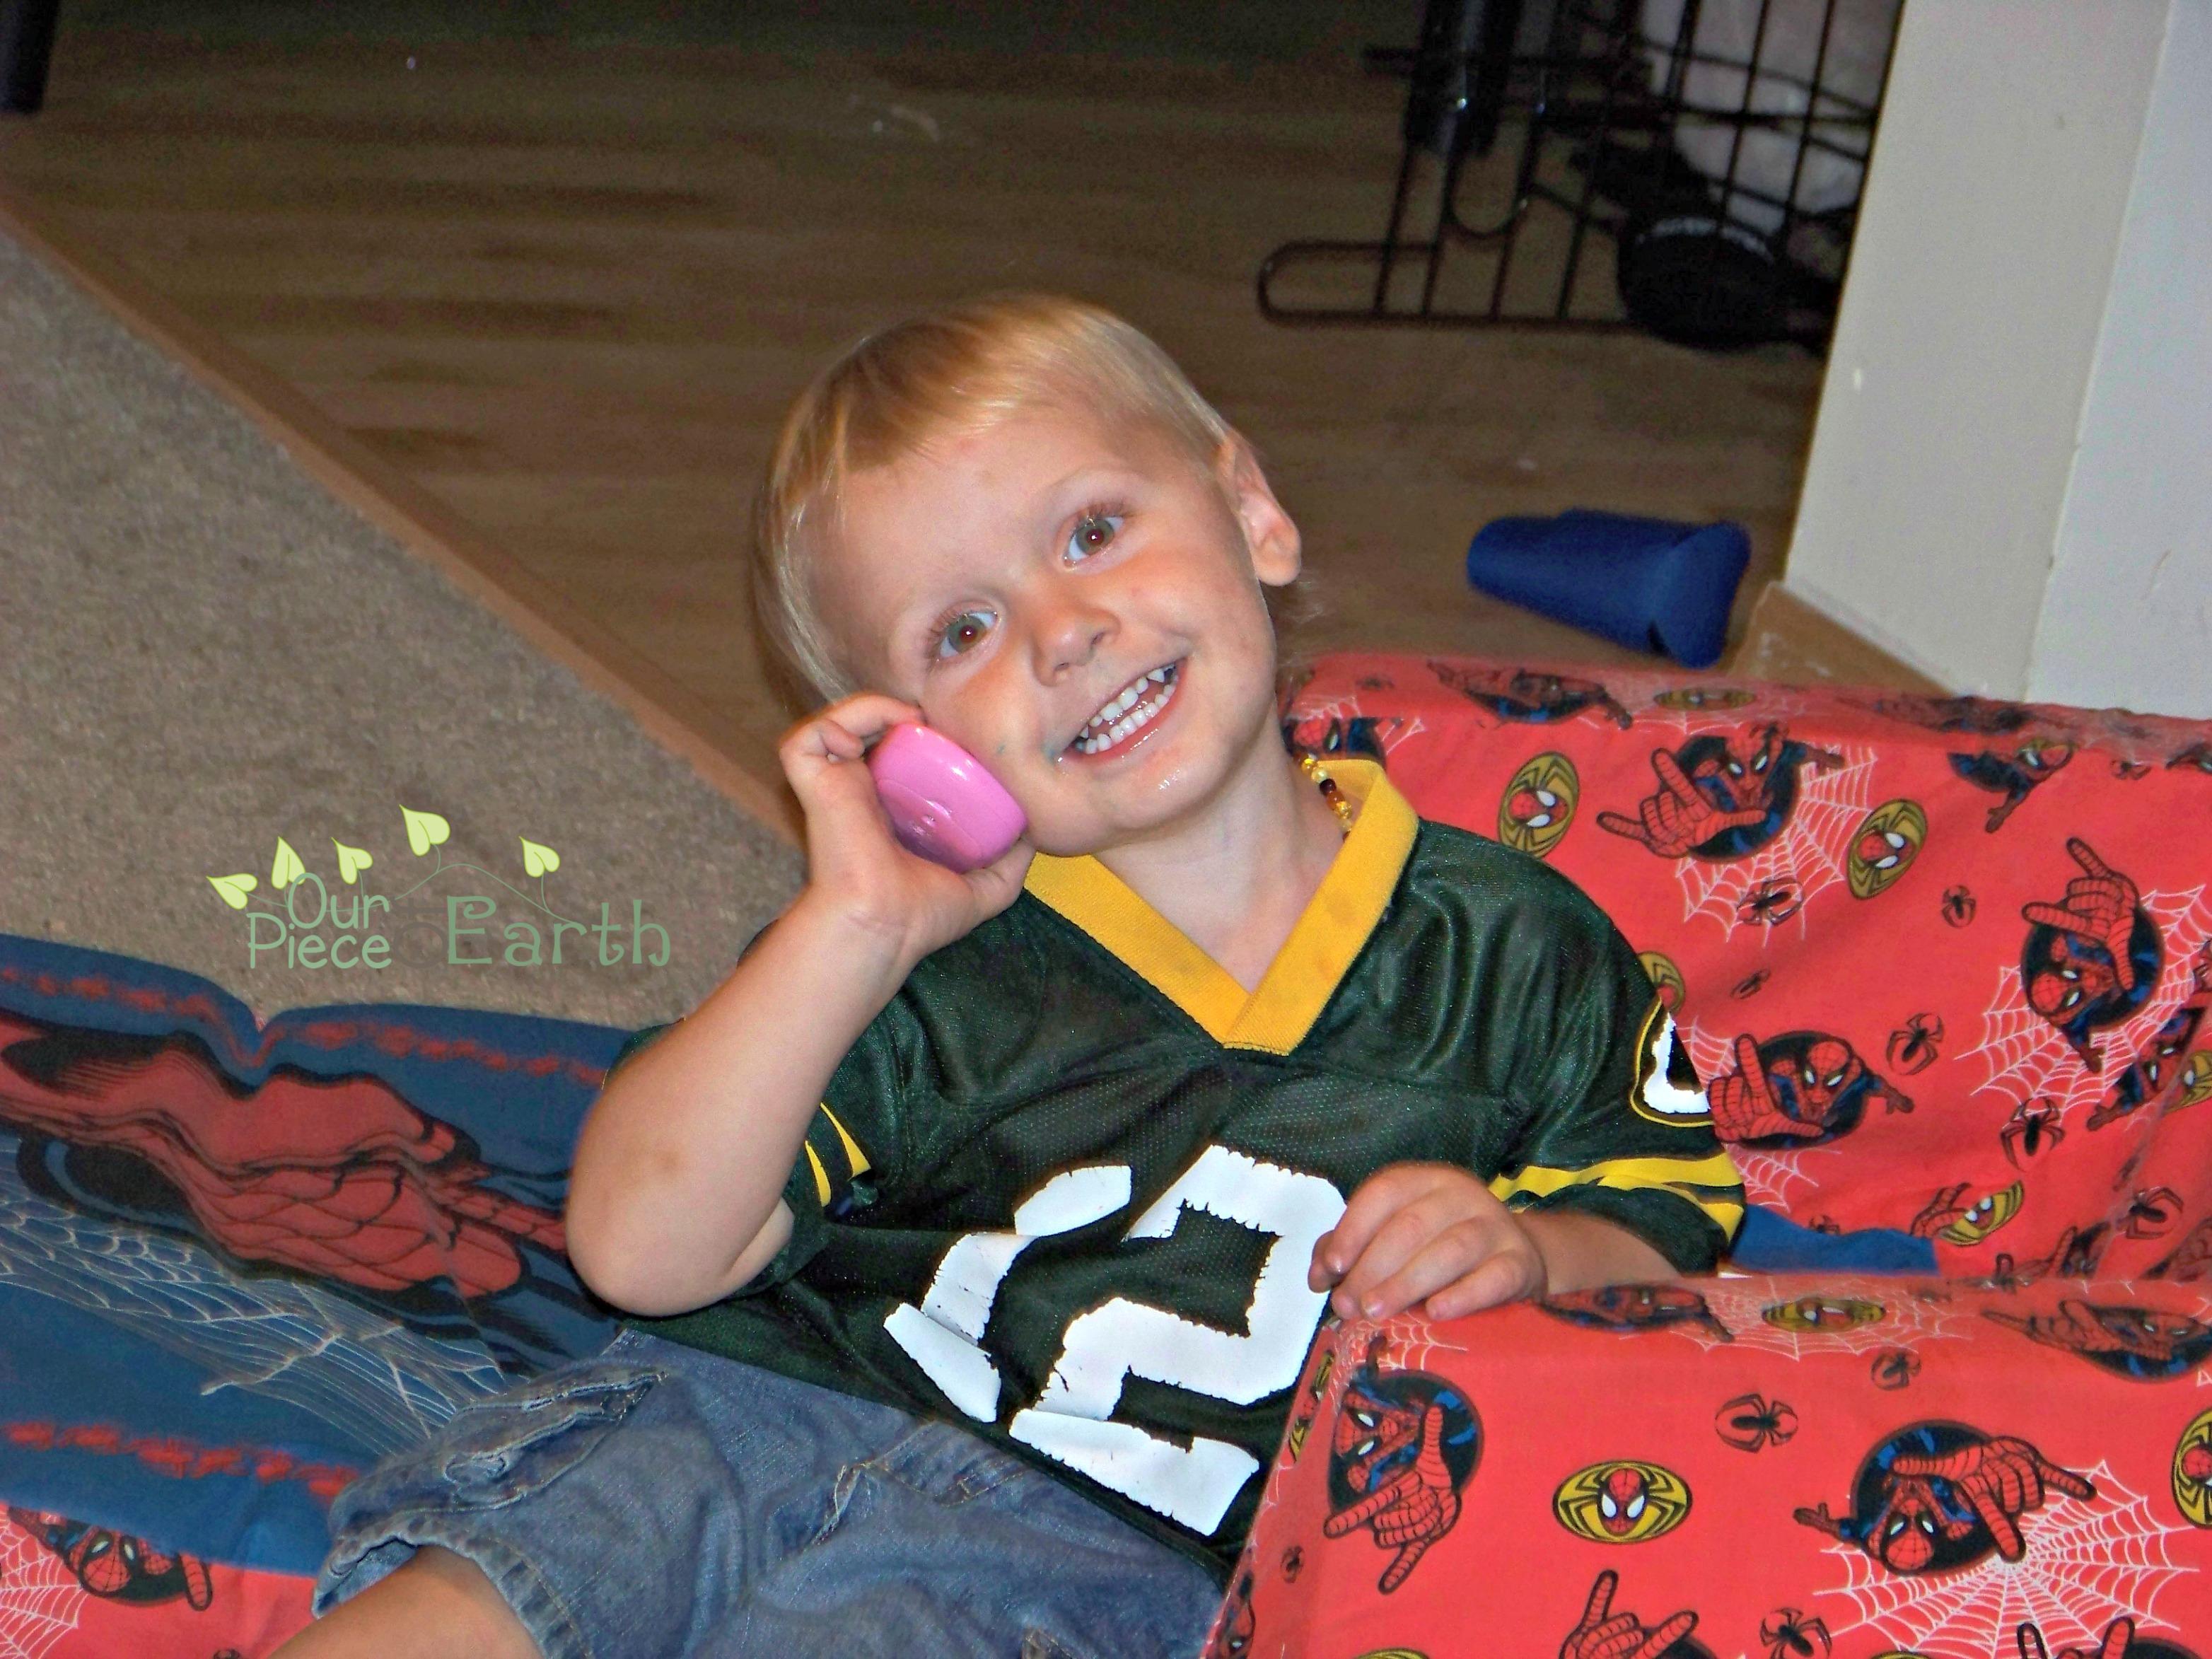 Charlie phone call